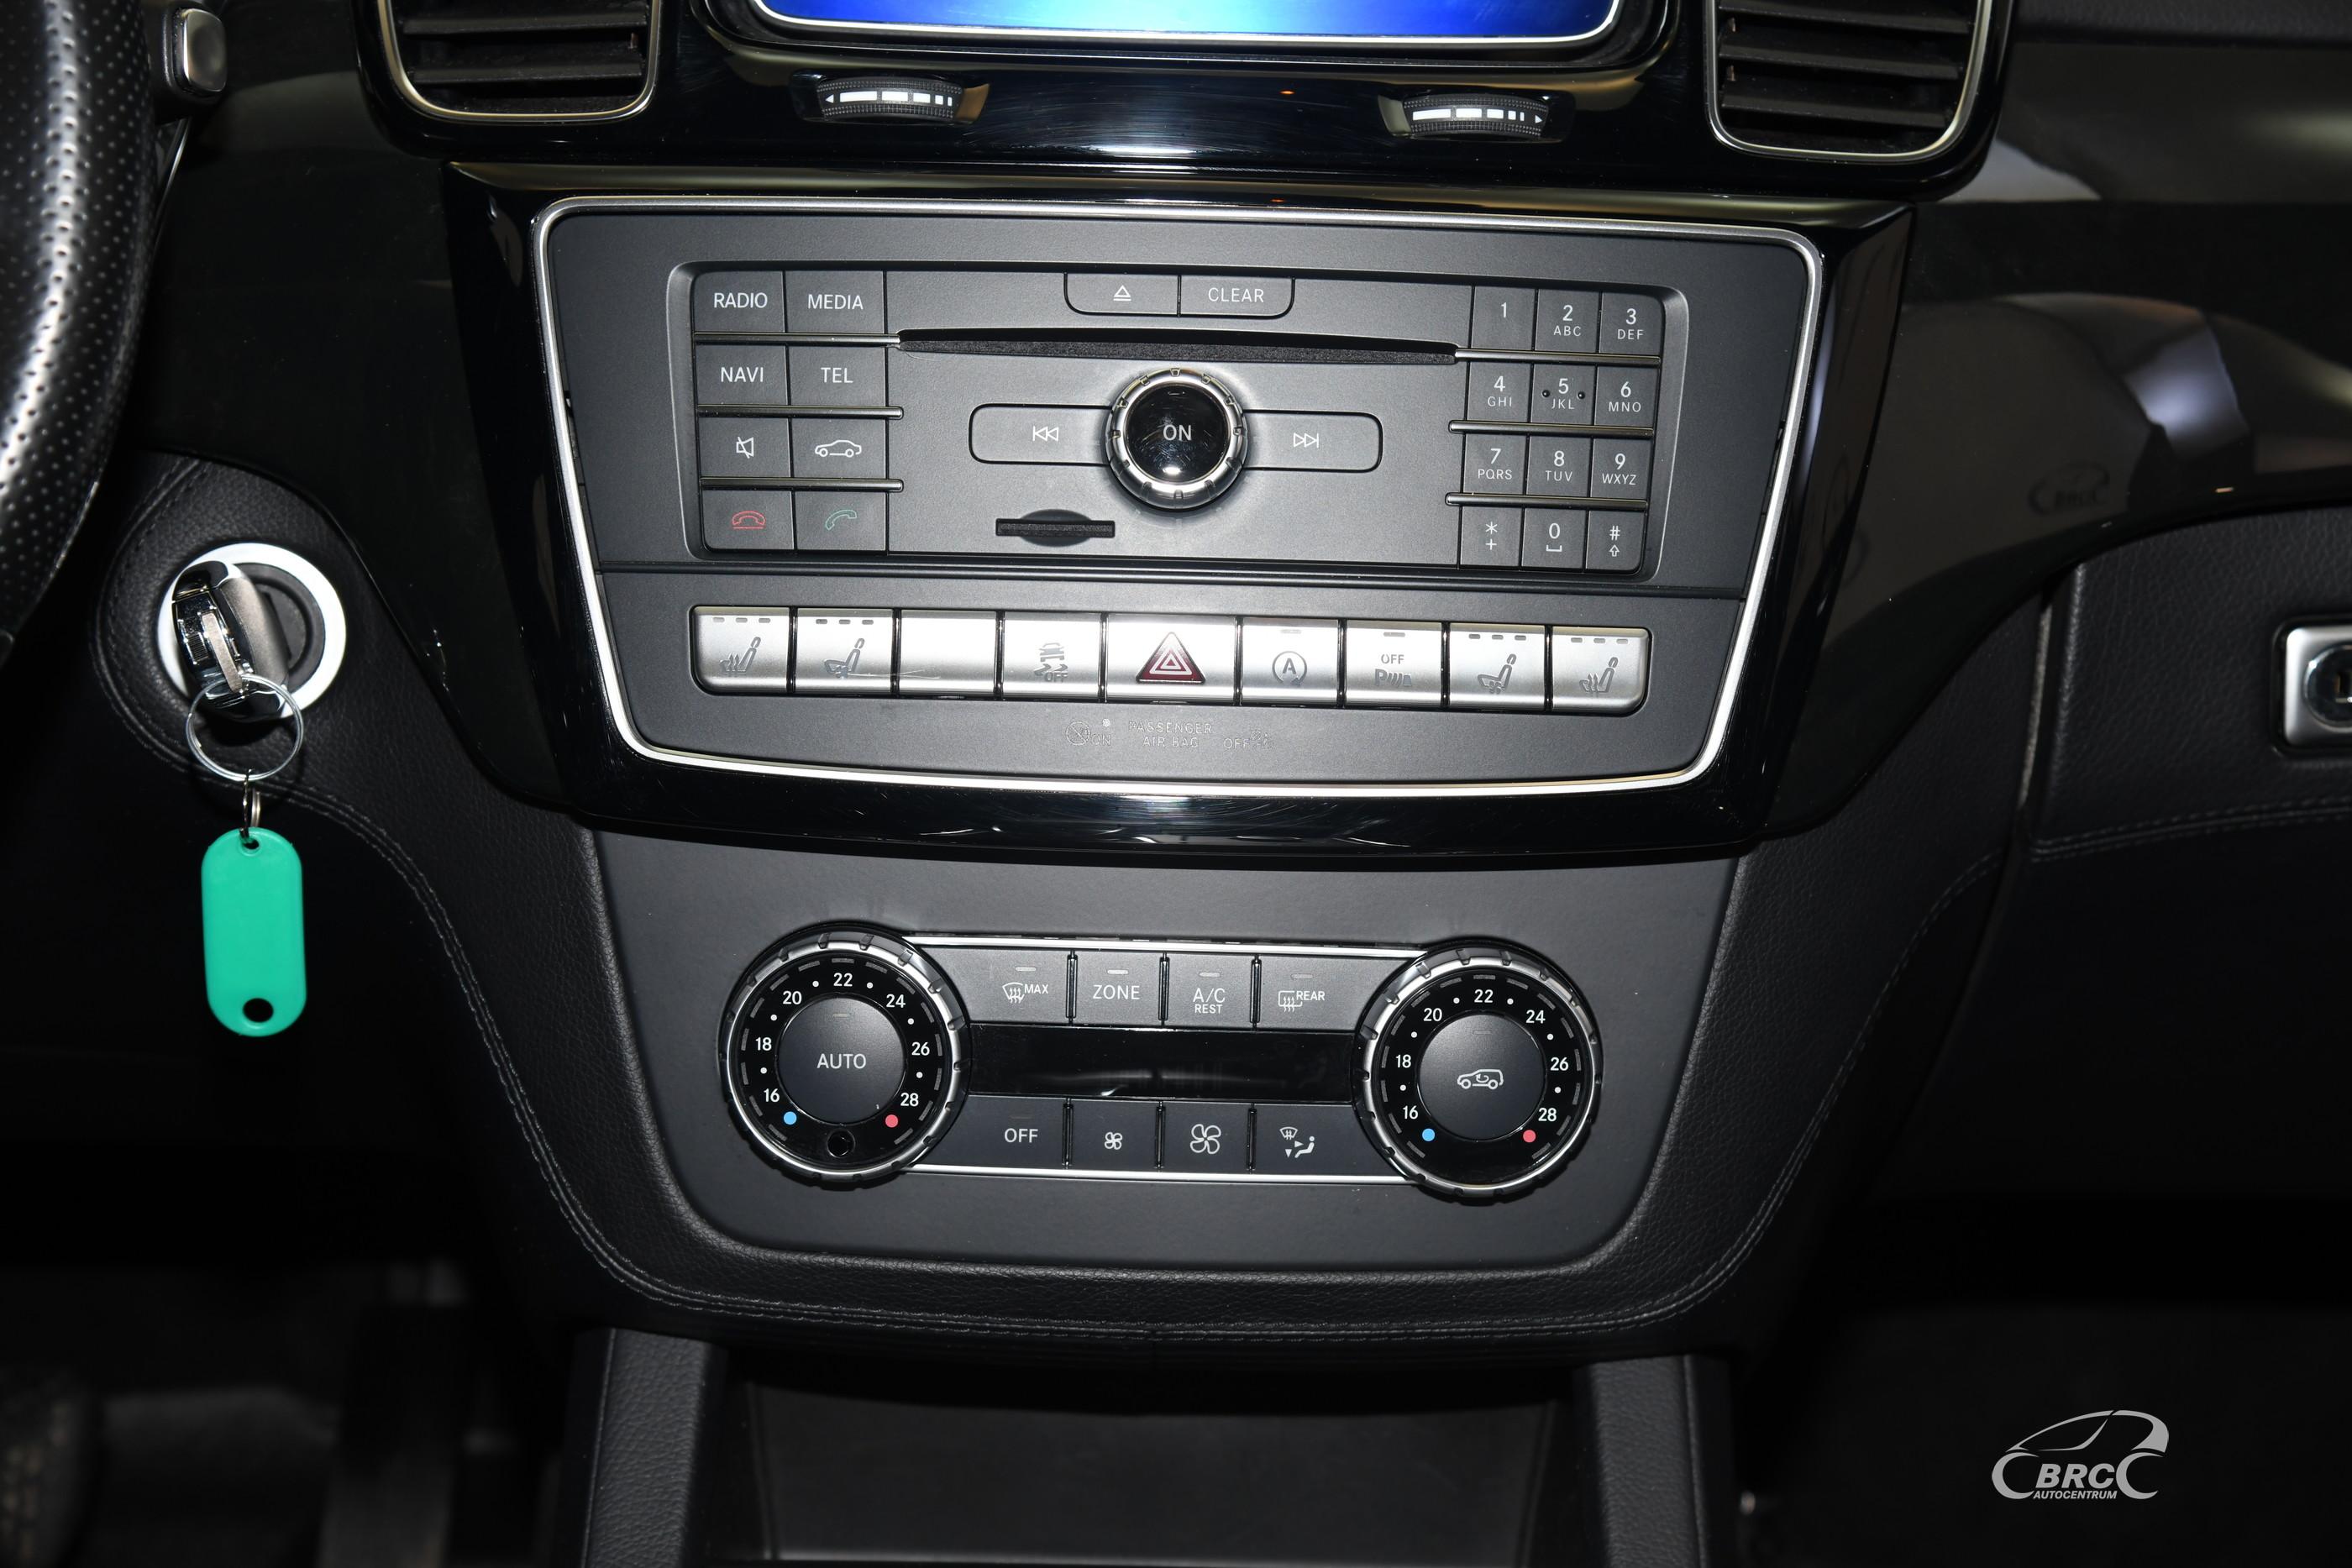 Mercedes-Benz GLE Coupe 350 d 4Matic Automatas